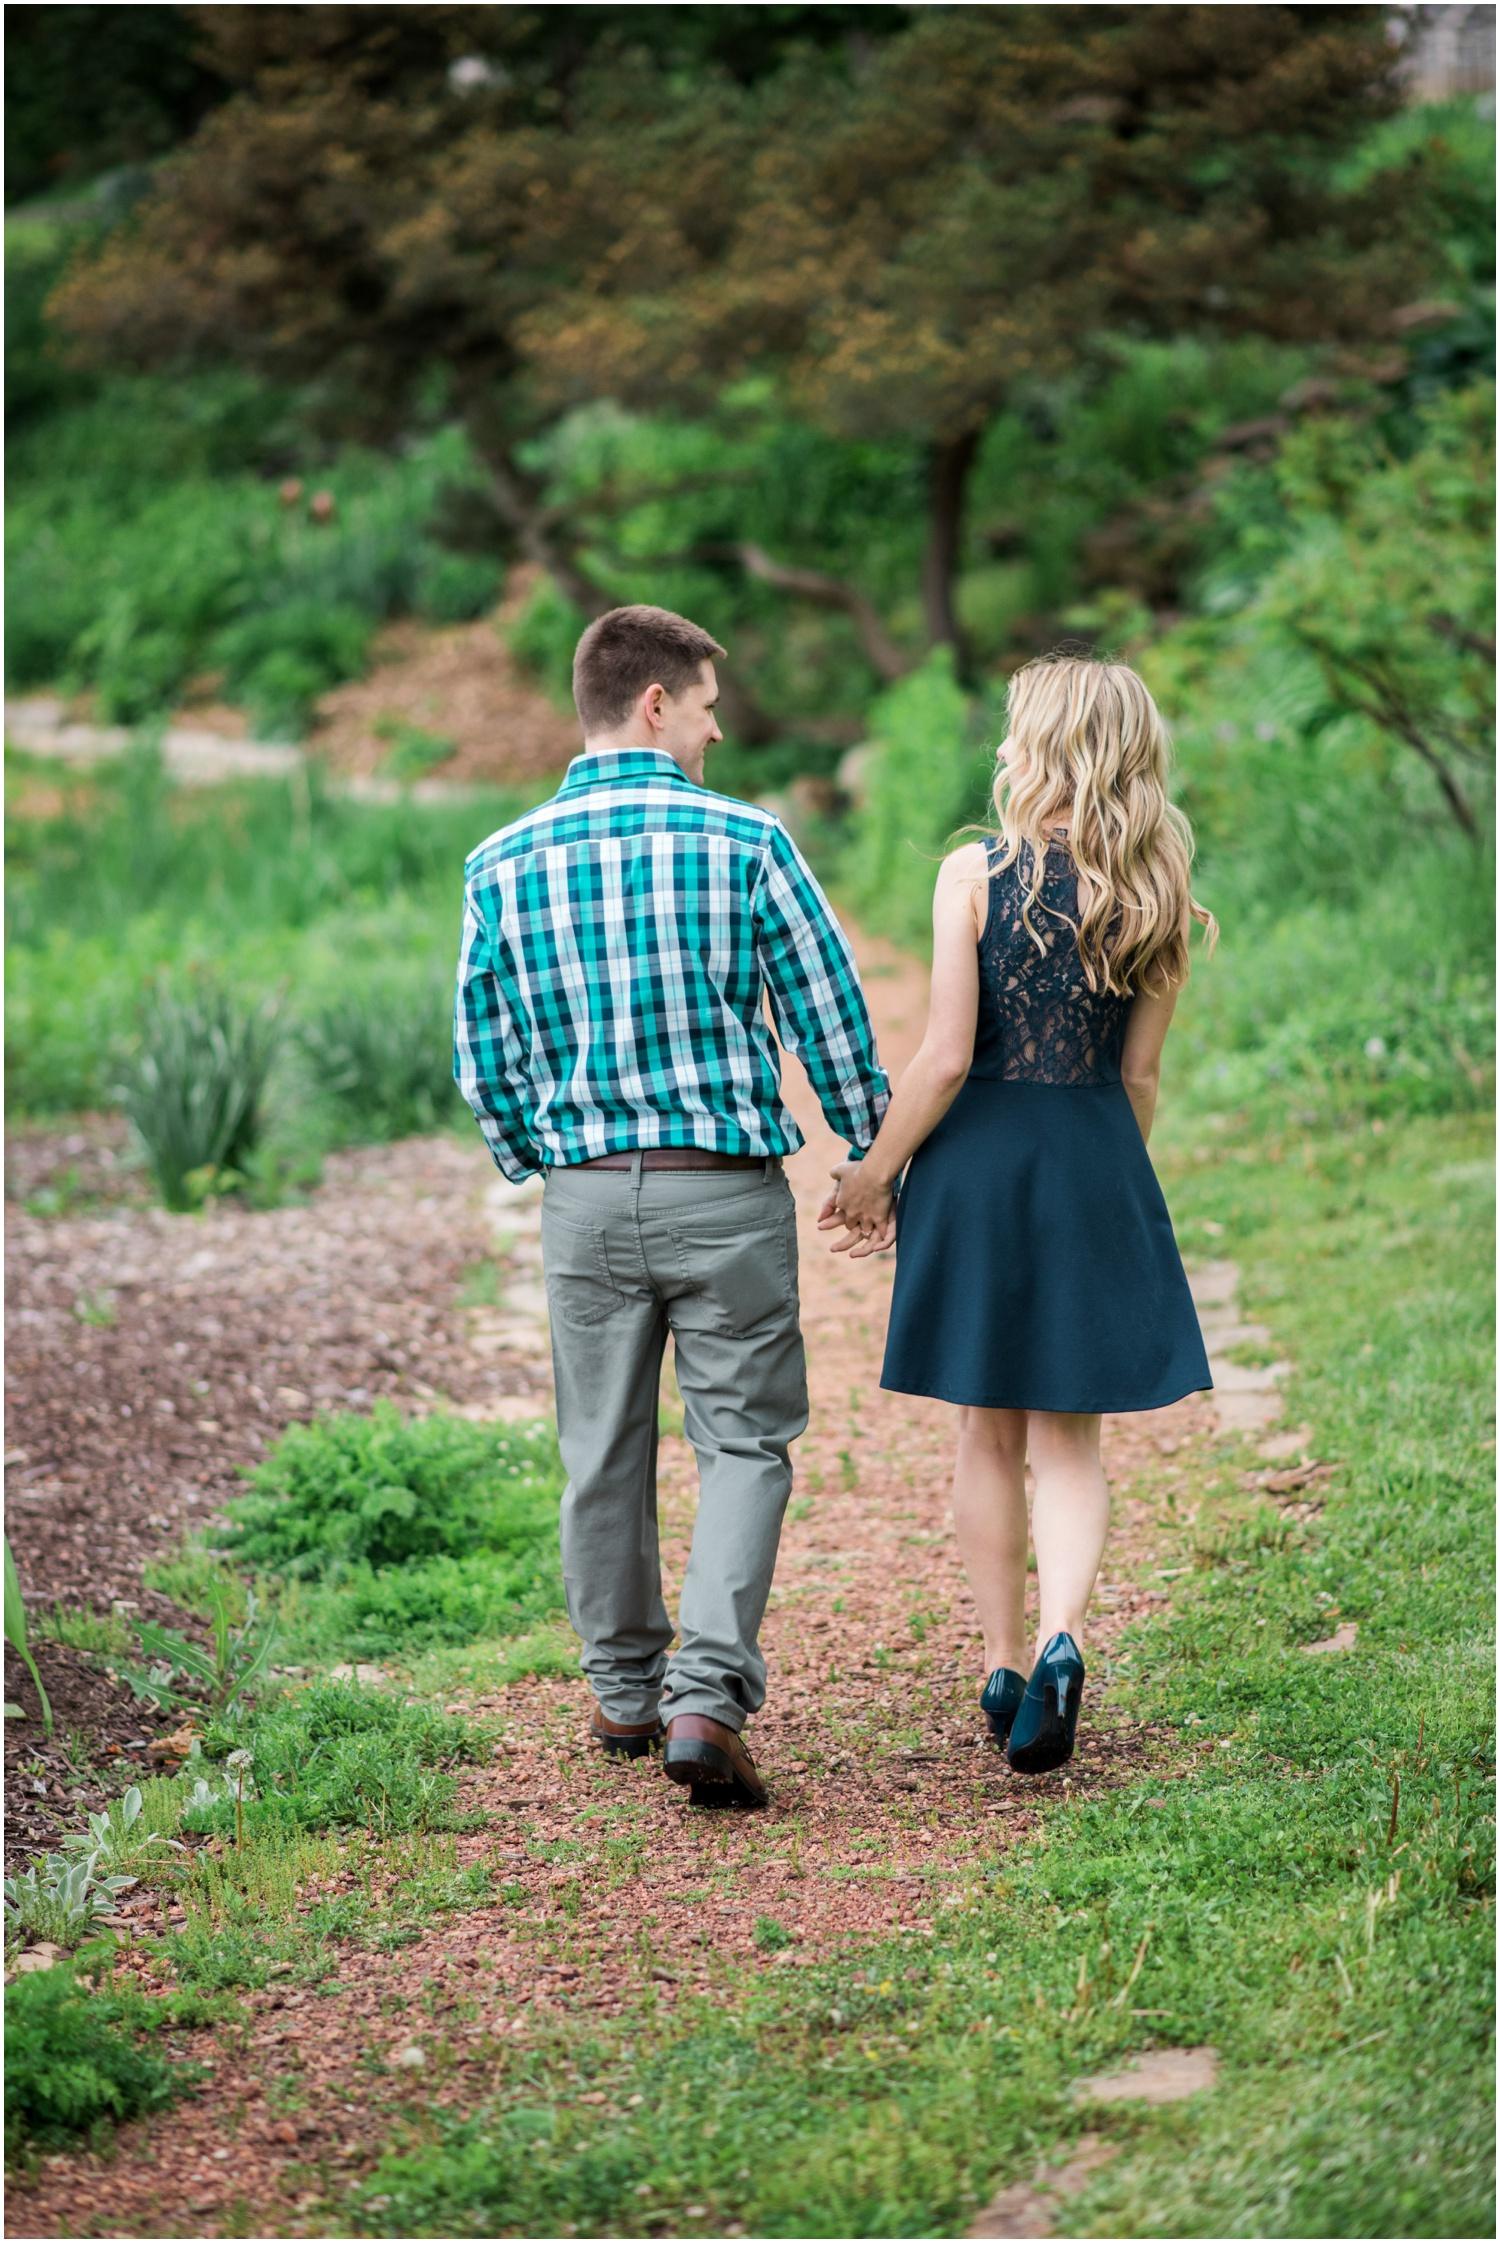 Paquette_Park_Portage_WI_Engagement_Photos_Heather_and_Derek_0025.jpg